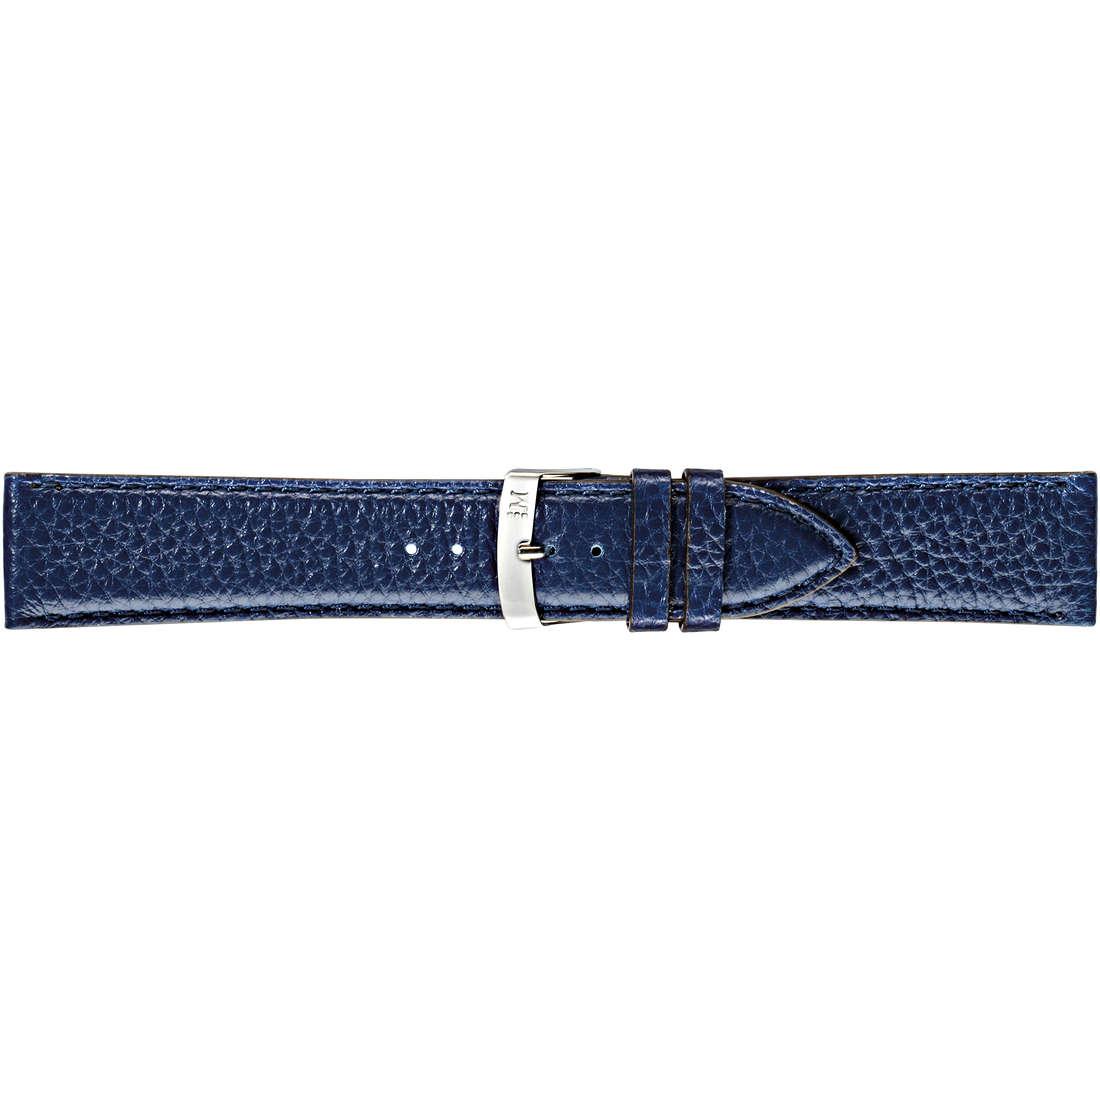 watch watch bands watch straps man Morellato Performance A01X4596B61062CR22